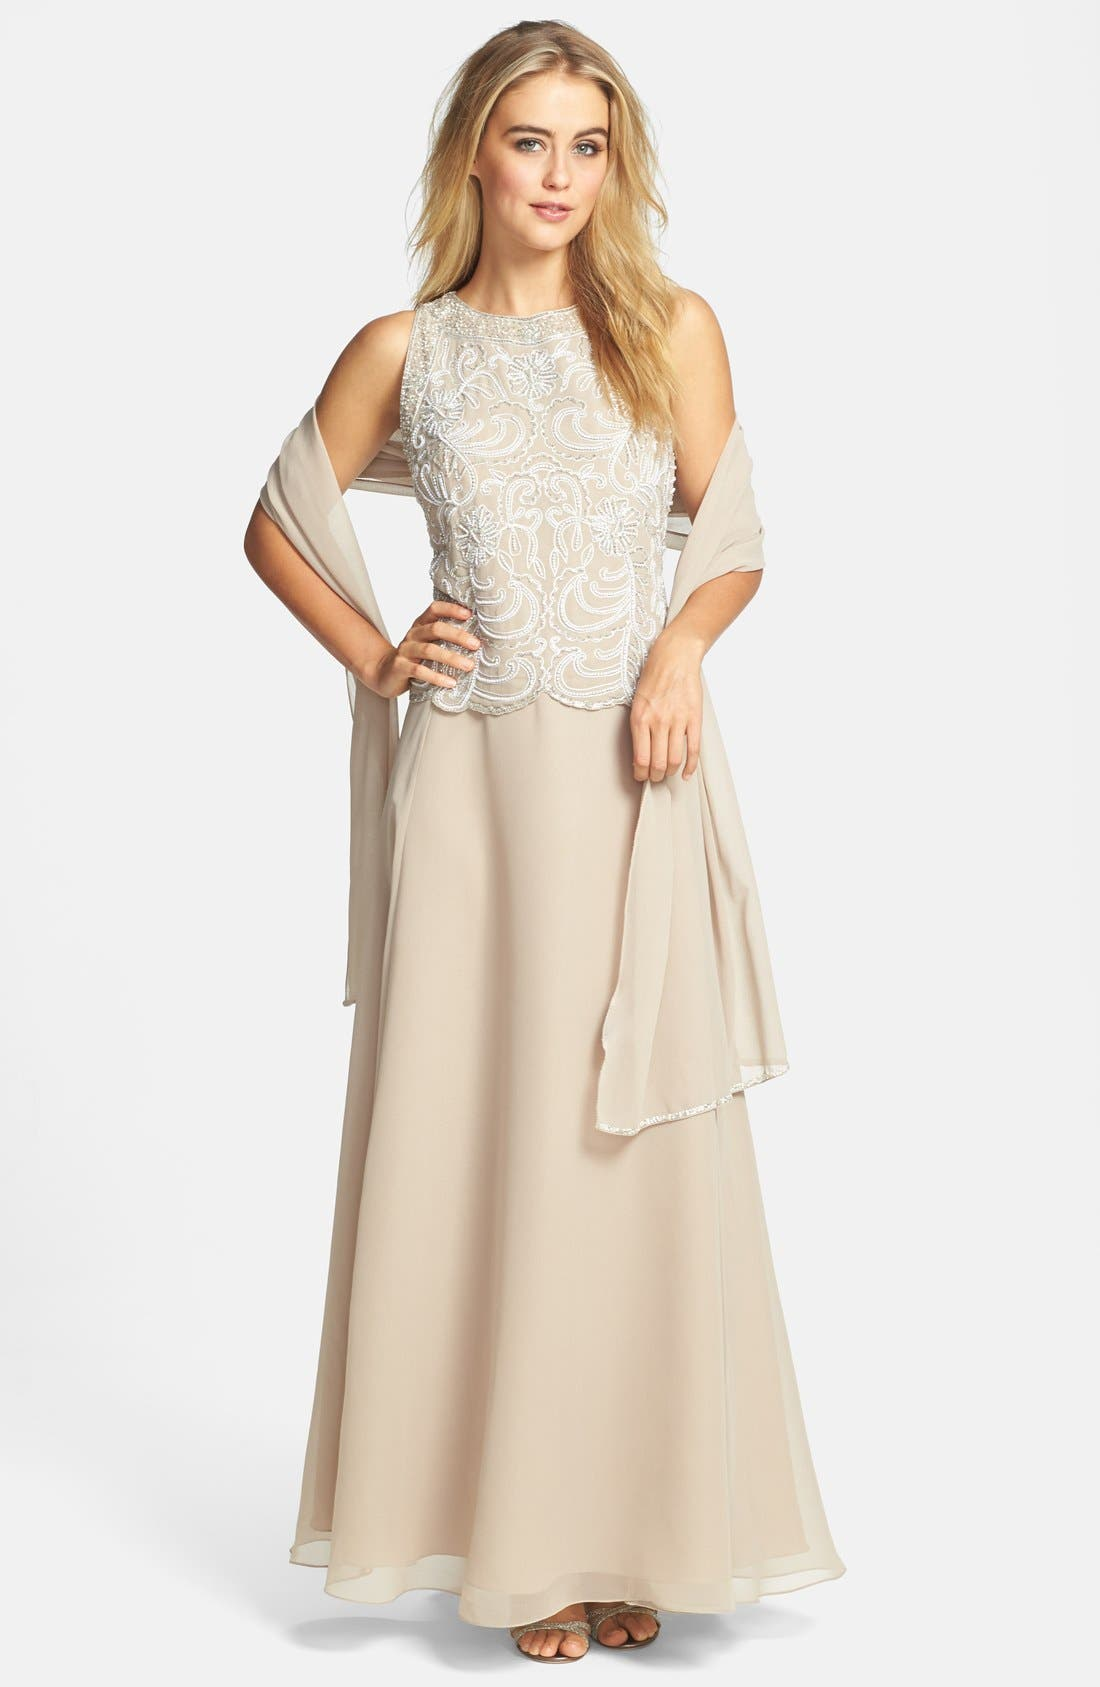 J KARA Embellished Chiffon A-Line Gown with Shawl, Main, color, 250